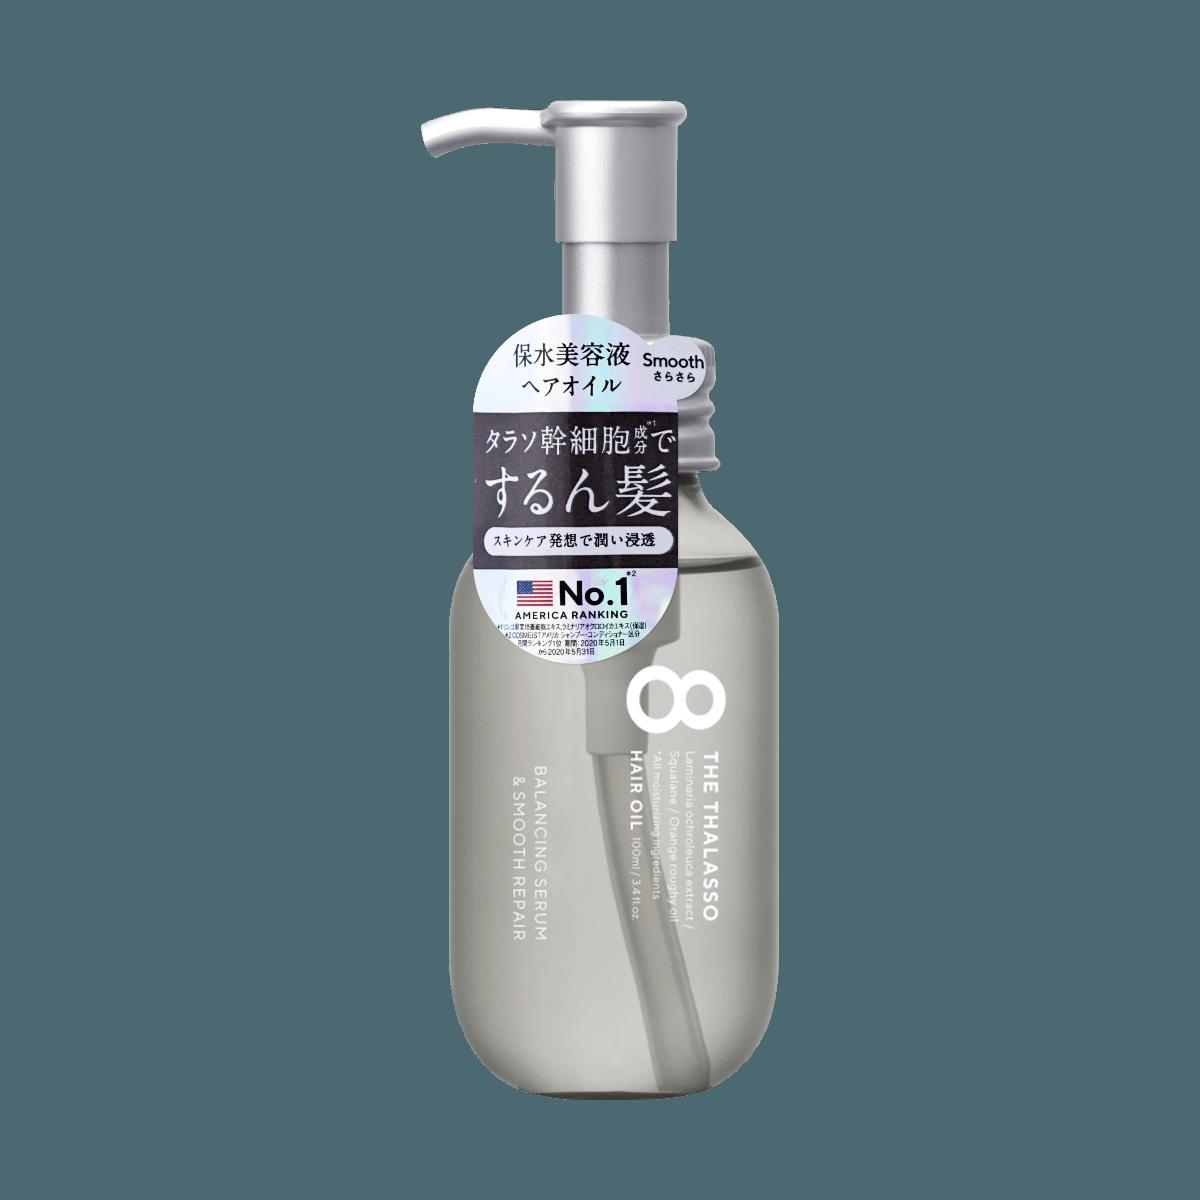 Yamibuy.com:Customer reviews:8 THE THALASSO Hair Oil Smooth 100ml